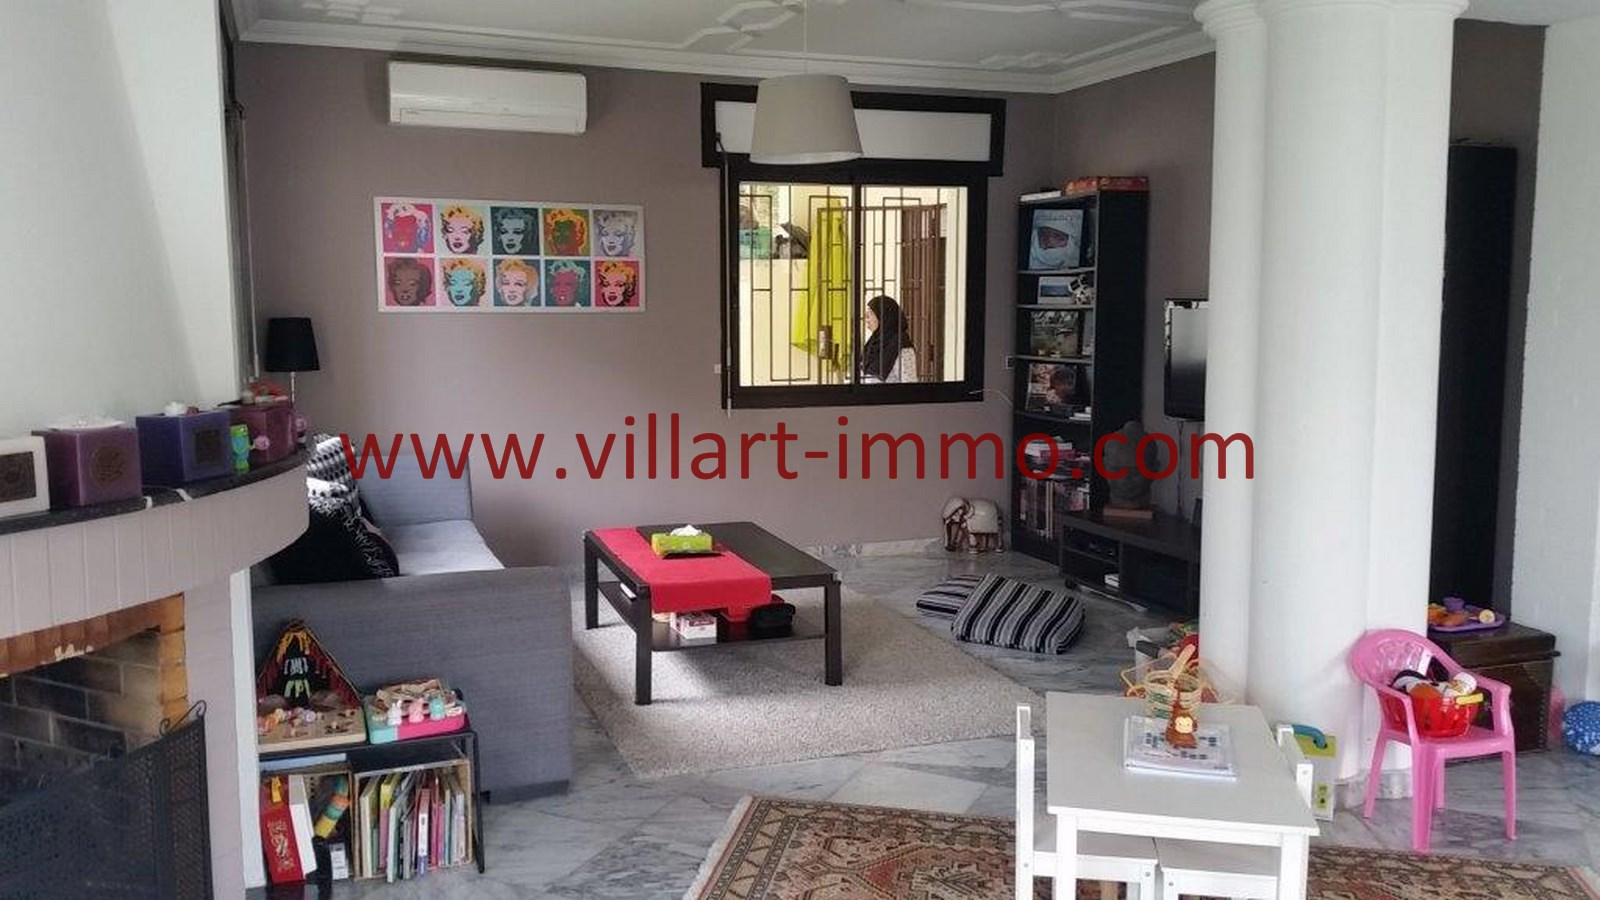 4-a-vendre-tanger-villa-californie-salon-2-vv459-villart-immo-agence-immobiliere